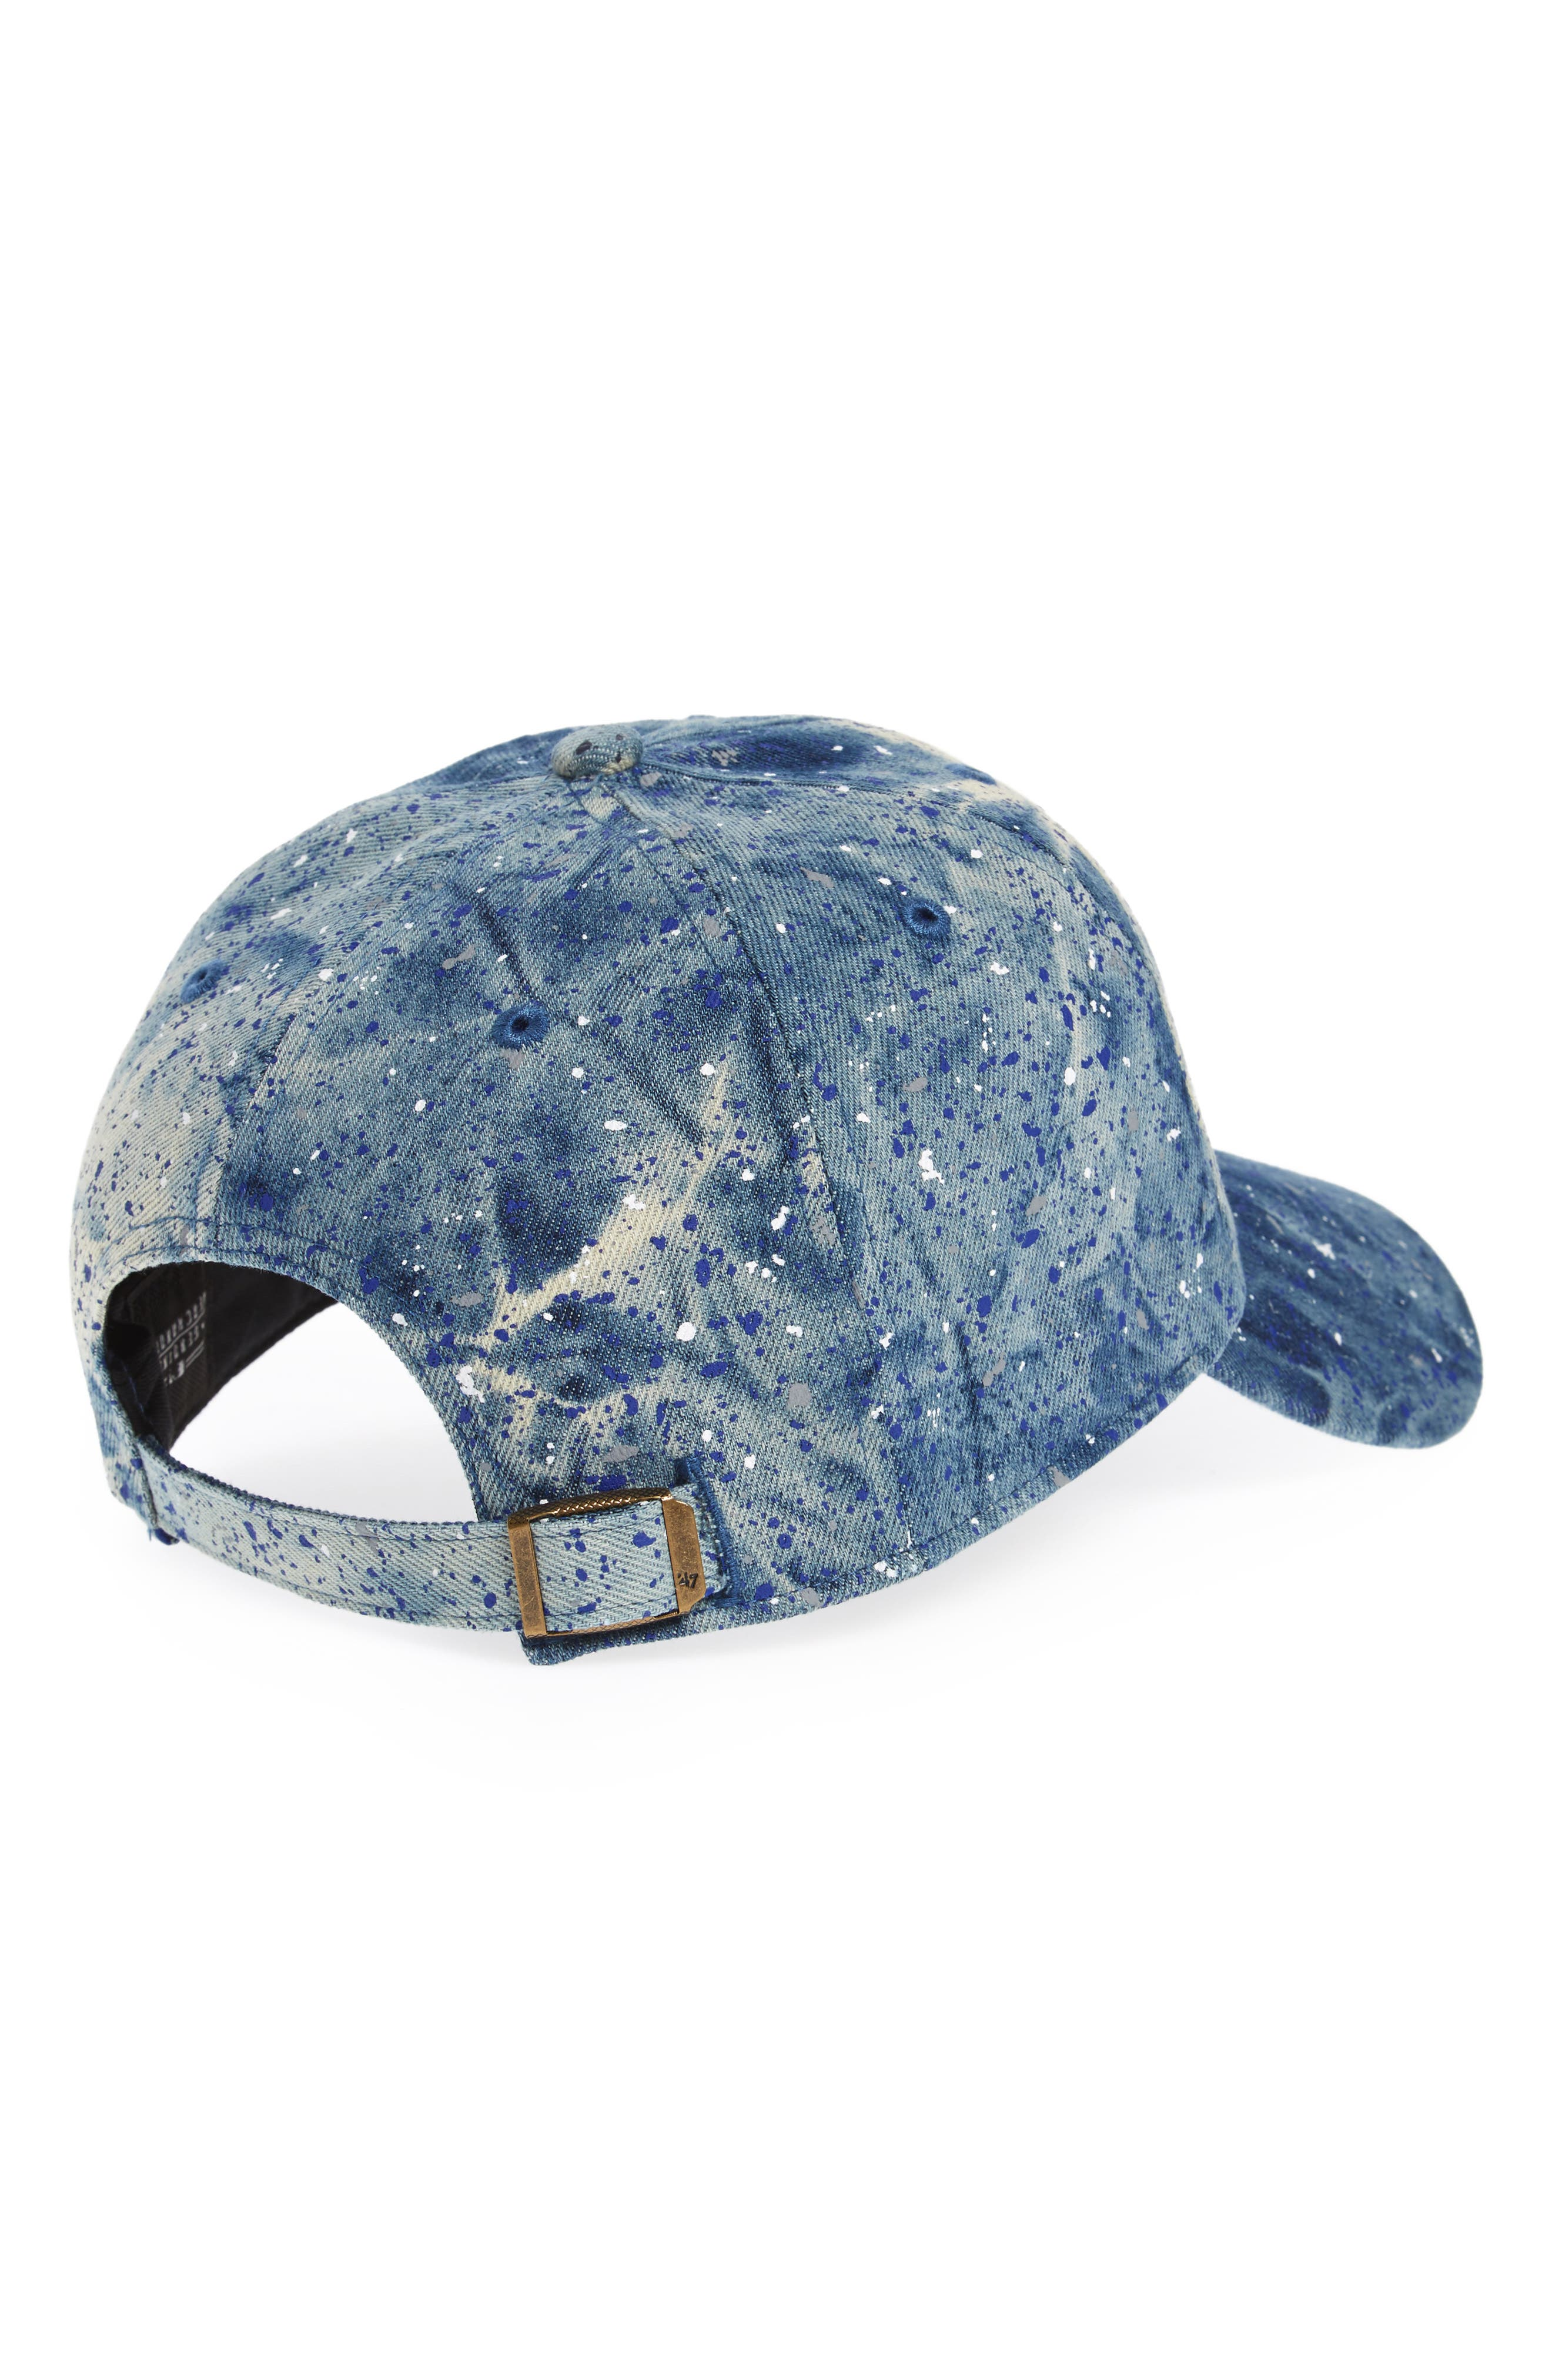 Los Angeles Dodgers - Blue Splatter Baseball Cap,                             Alternate thumbnail 2, color,                             Blue